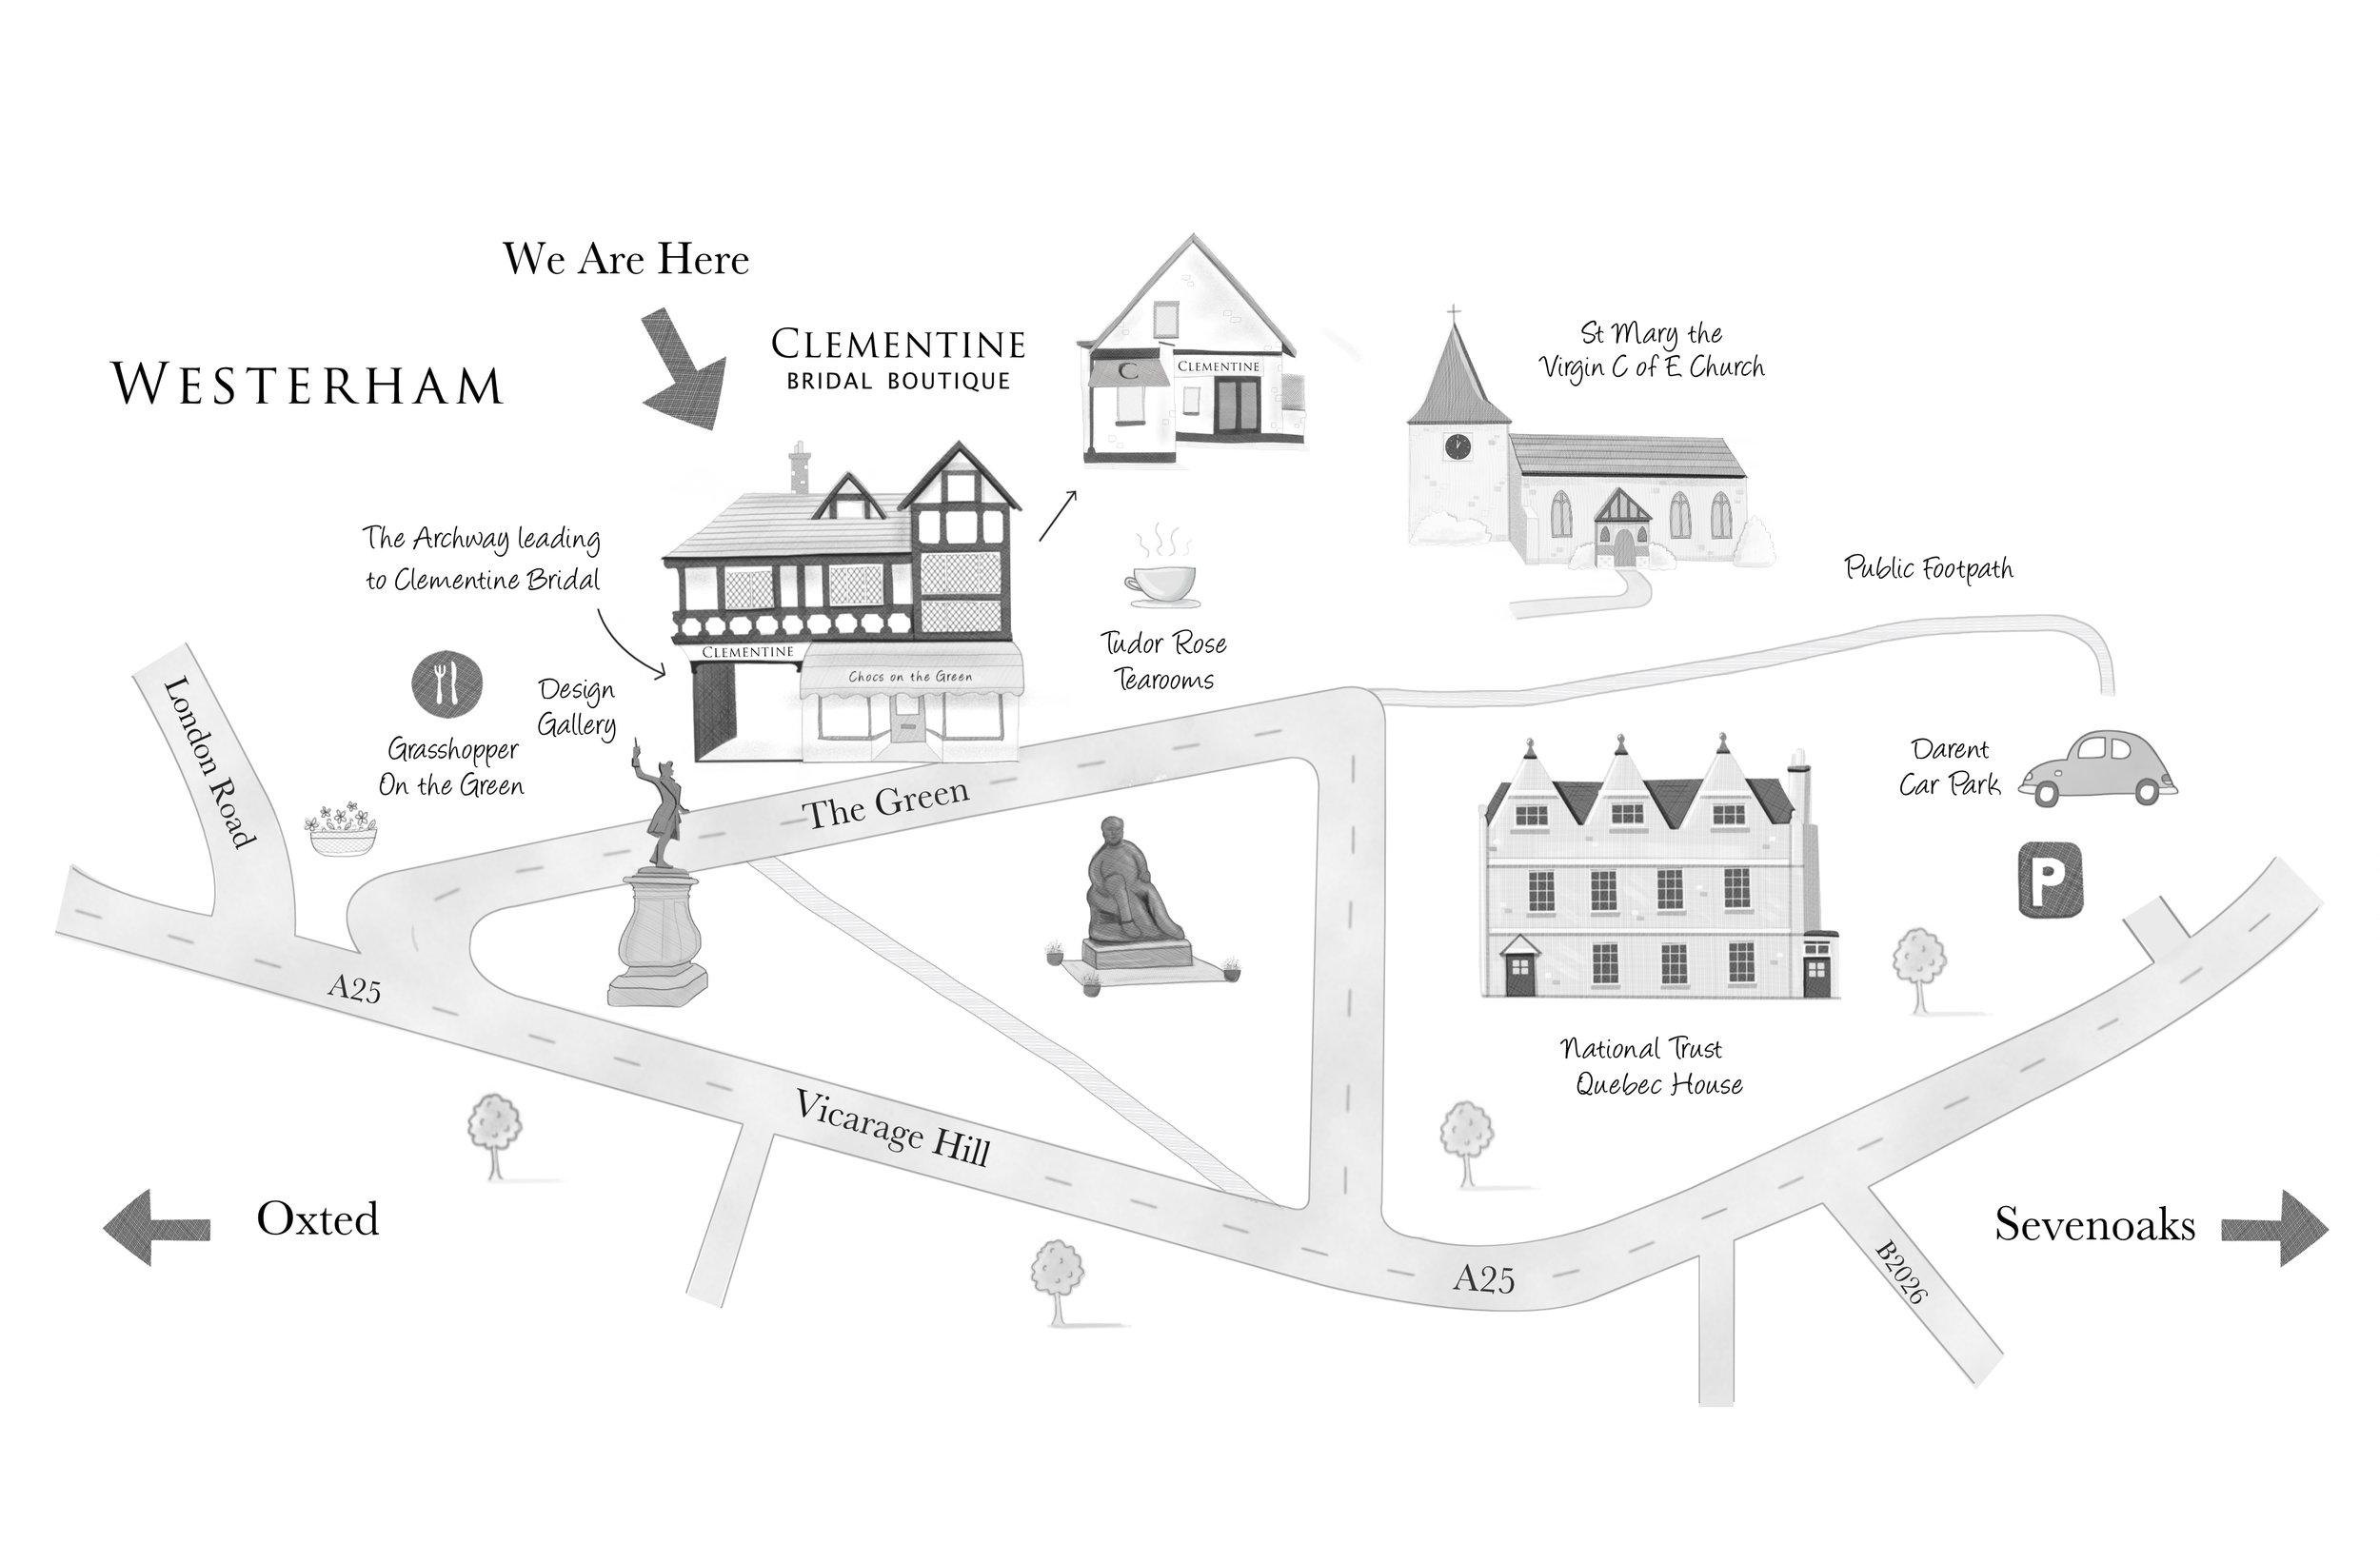 Westerham Map.jpg